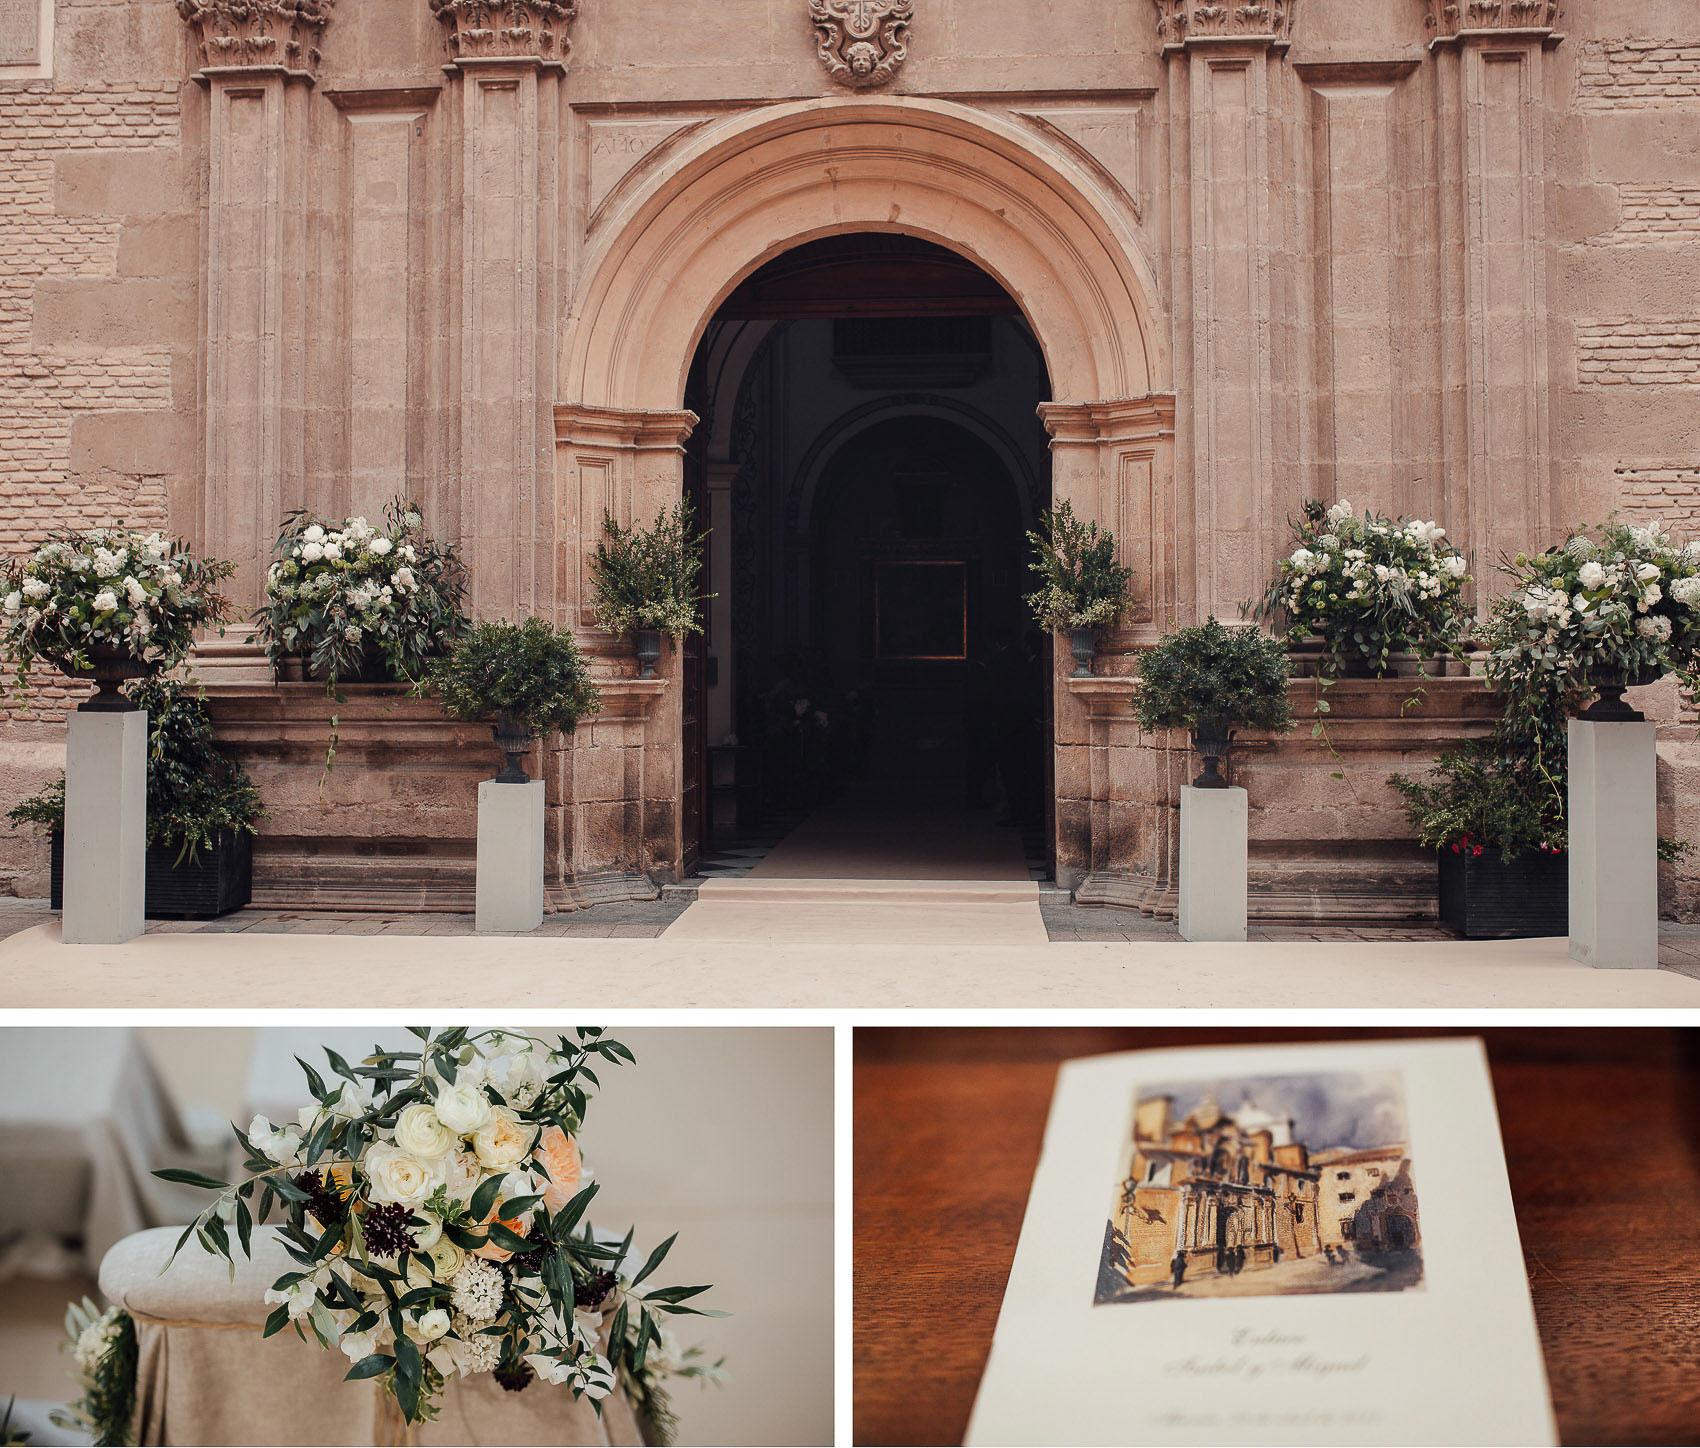 detalles iglesia decoracion valisse flores pedro navarro